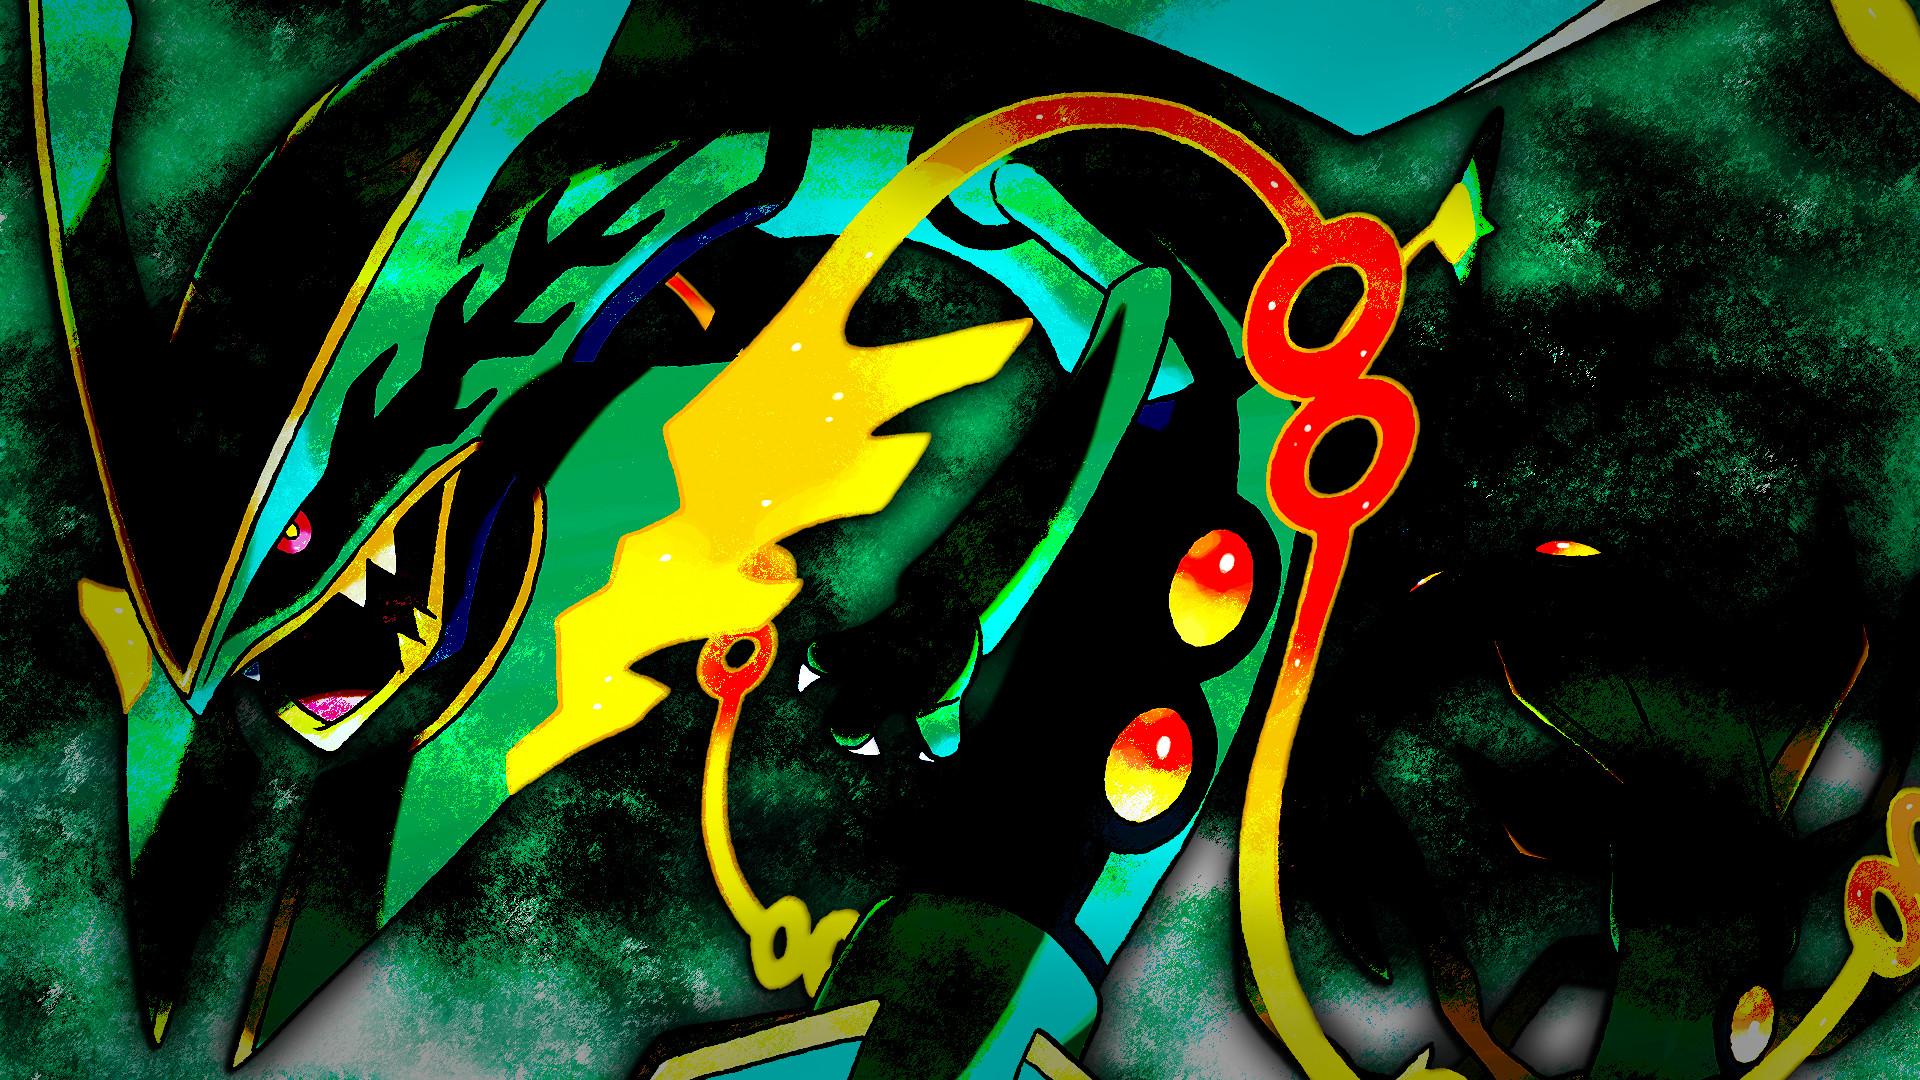 Mega Rayquaza Wallpaper HD Wallpapers on picsfair.com